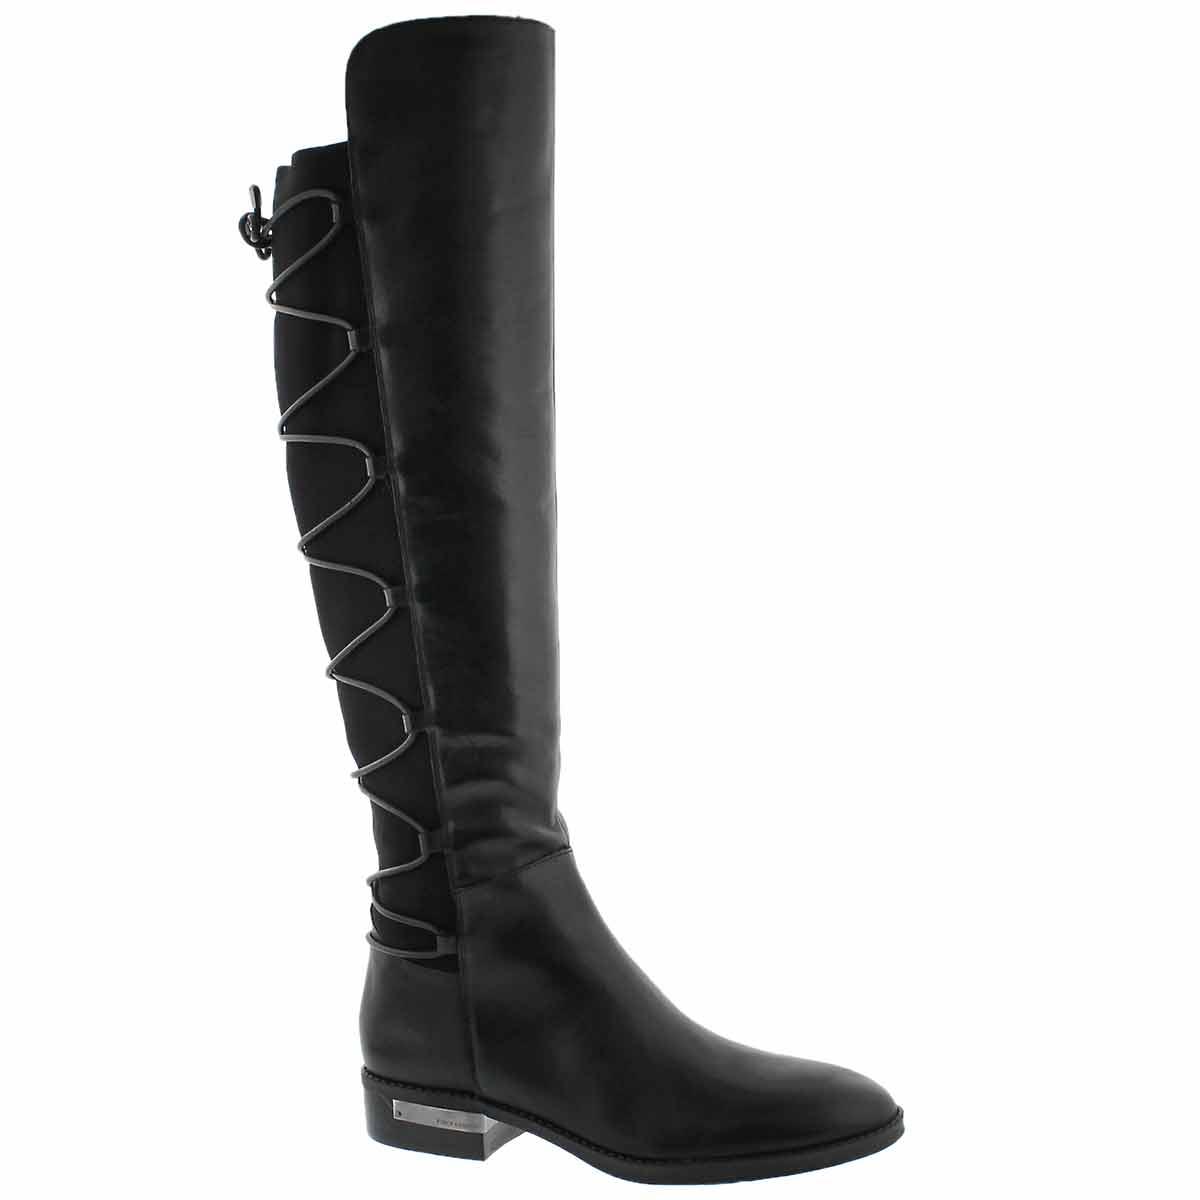 Women's PARLE black knee high dress boots